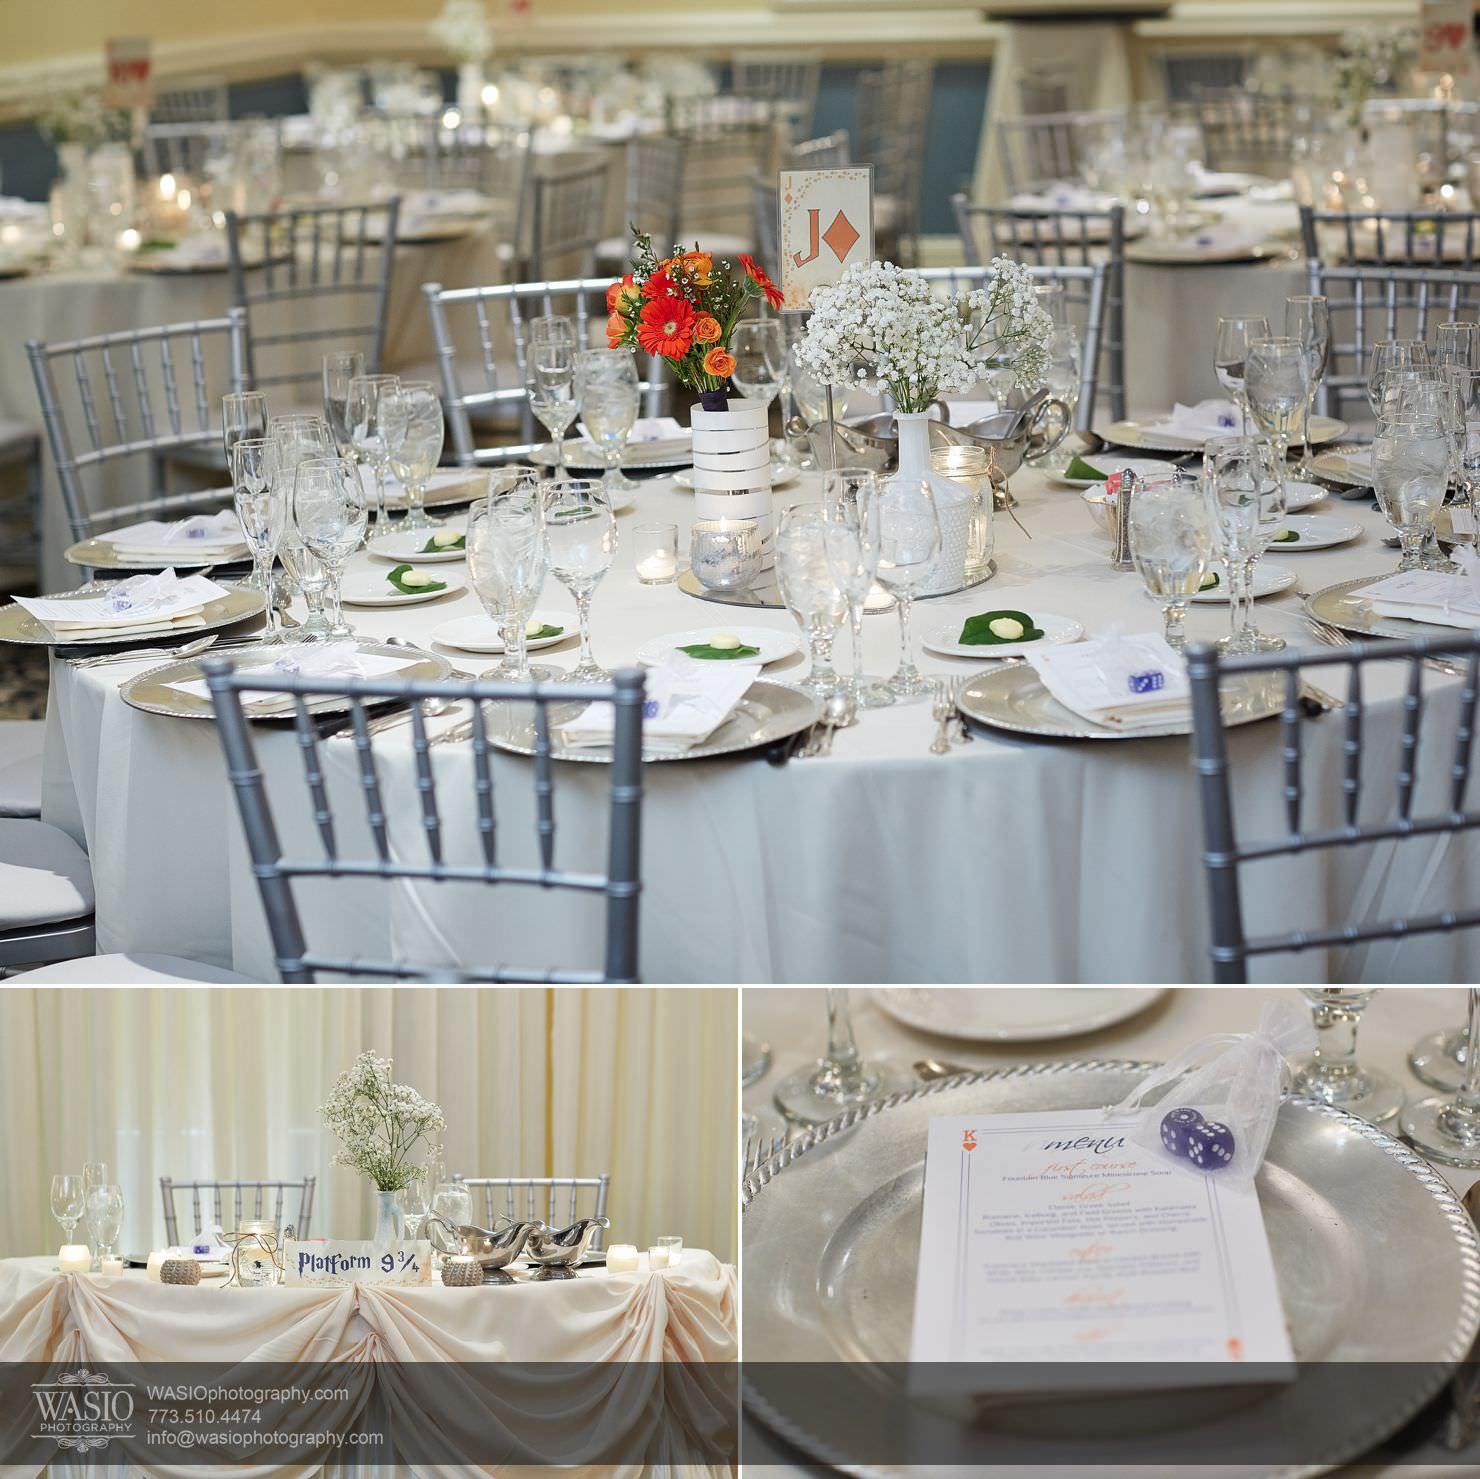 Rosemont-Fall-Wedding-Lauren-and-David-024 Rosemont Fall Wedding - Lauren + David